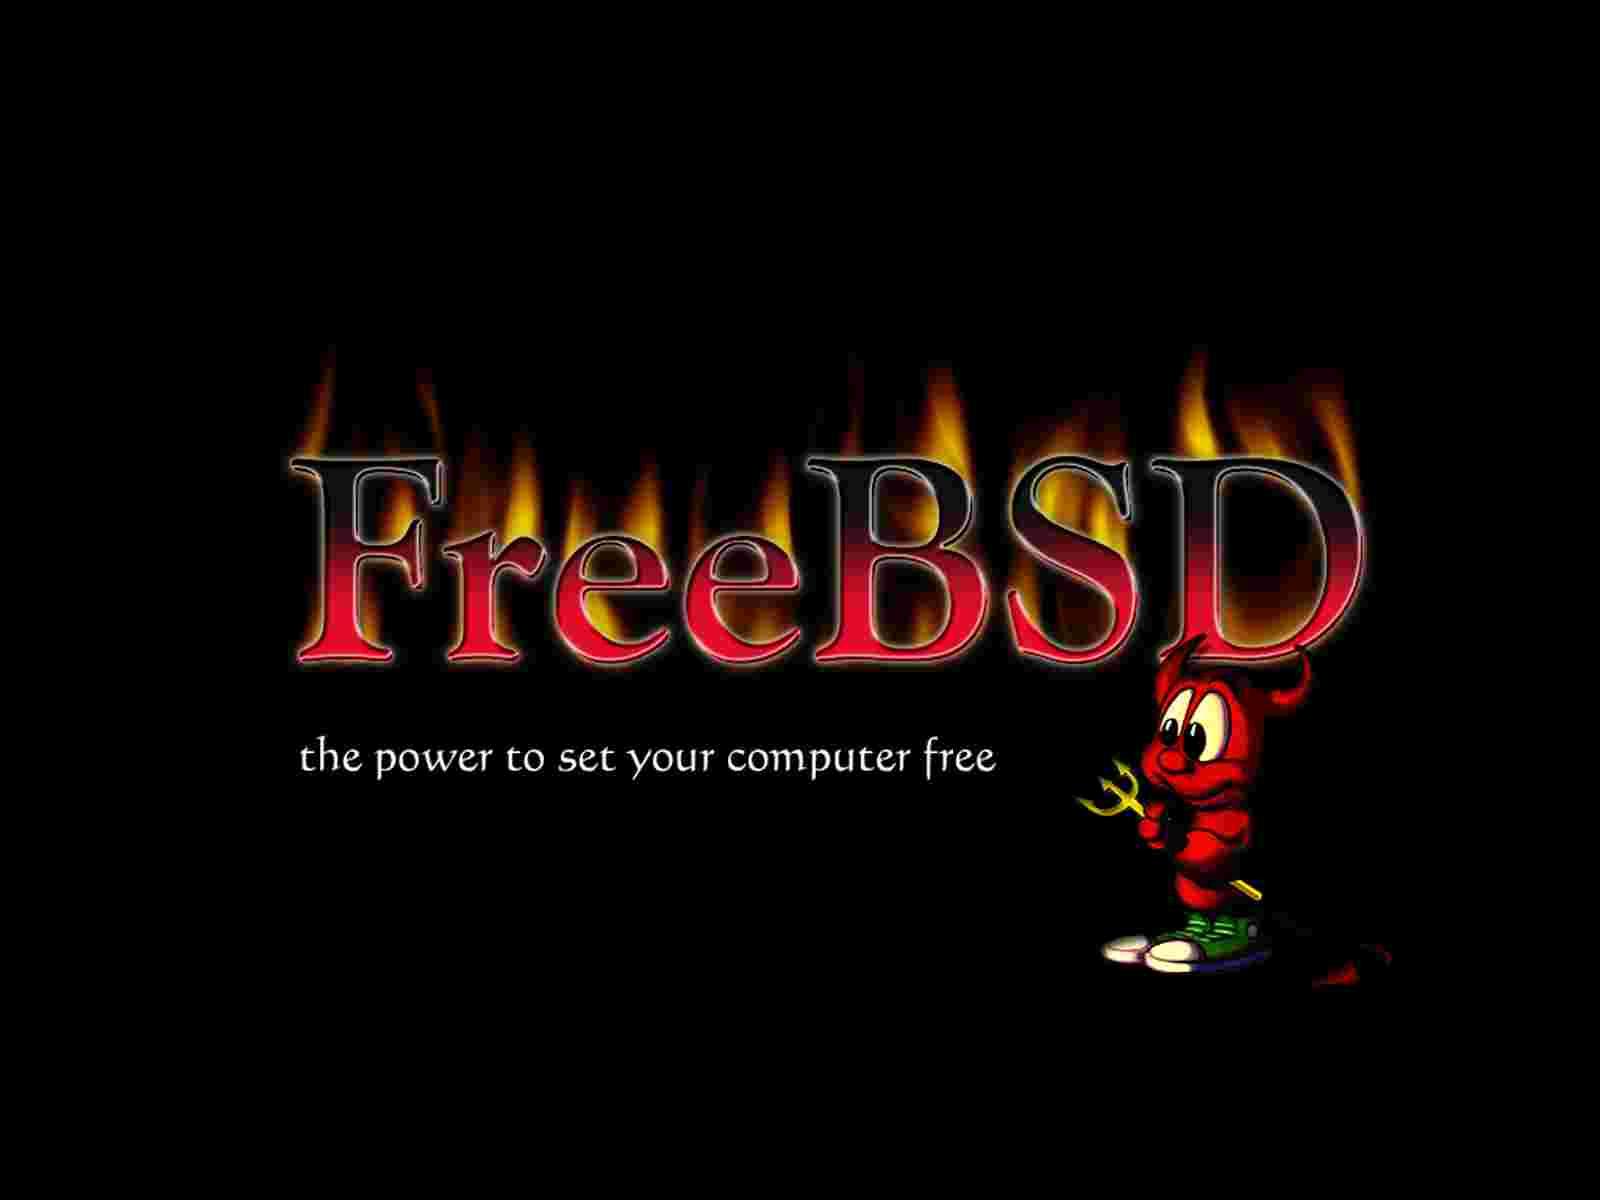 freebsd 381011 wallpaper   FreeBSD   Software OS   Wallpaper 1600x1200